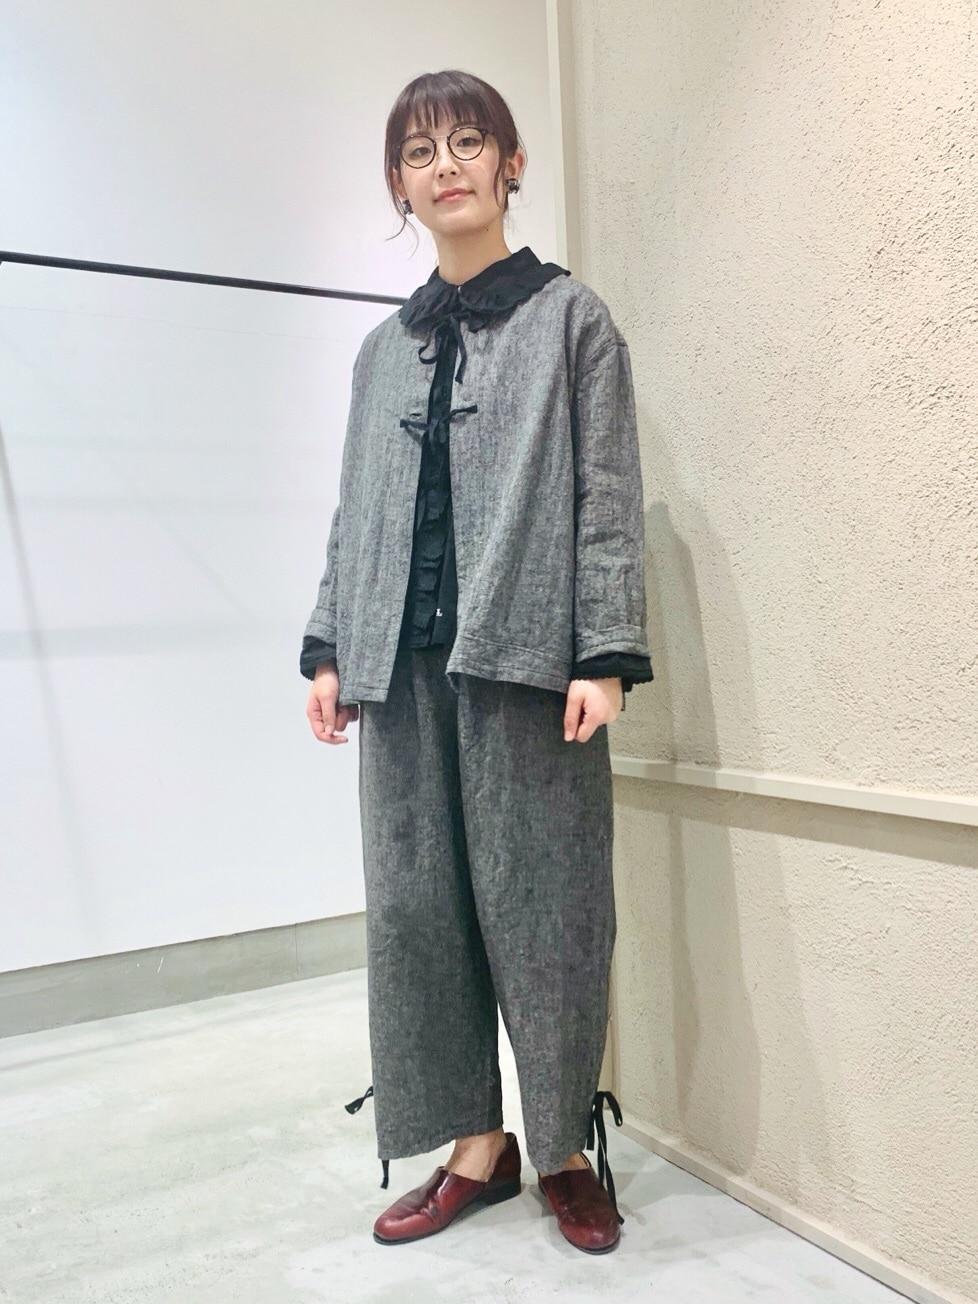 chambre de charme 横浜ジョイナス 身長:162cm 2021.02.23